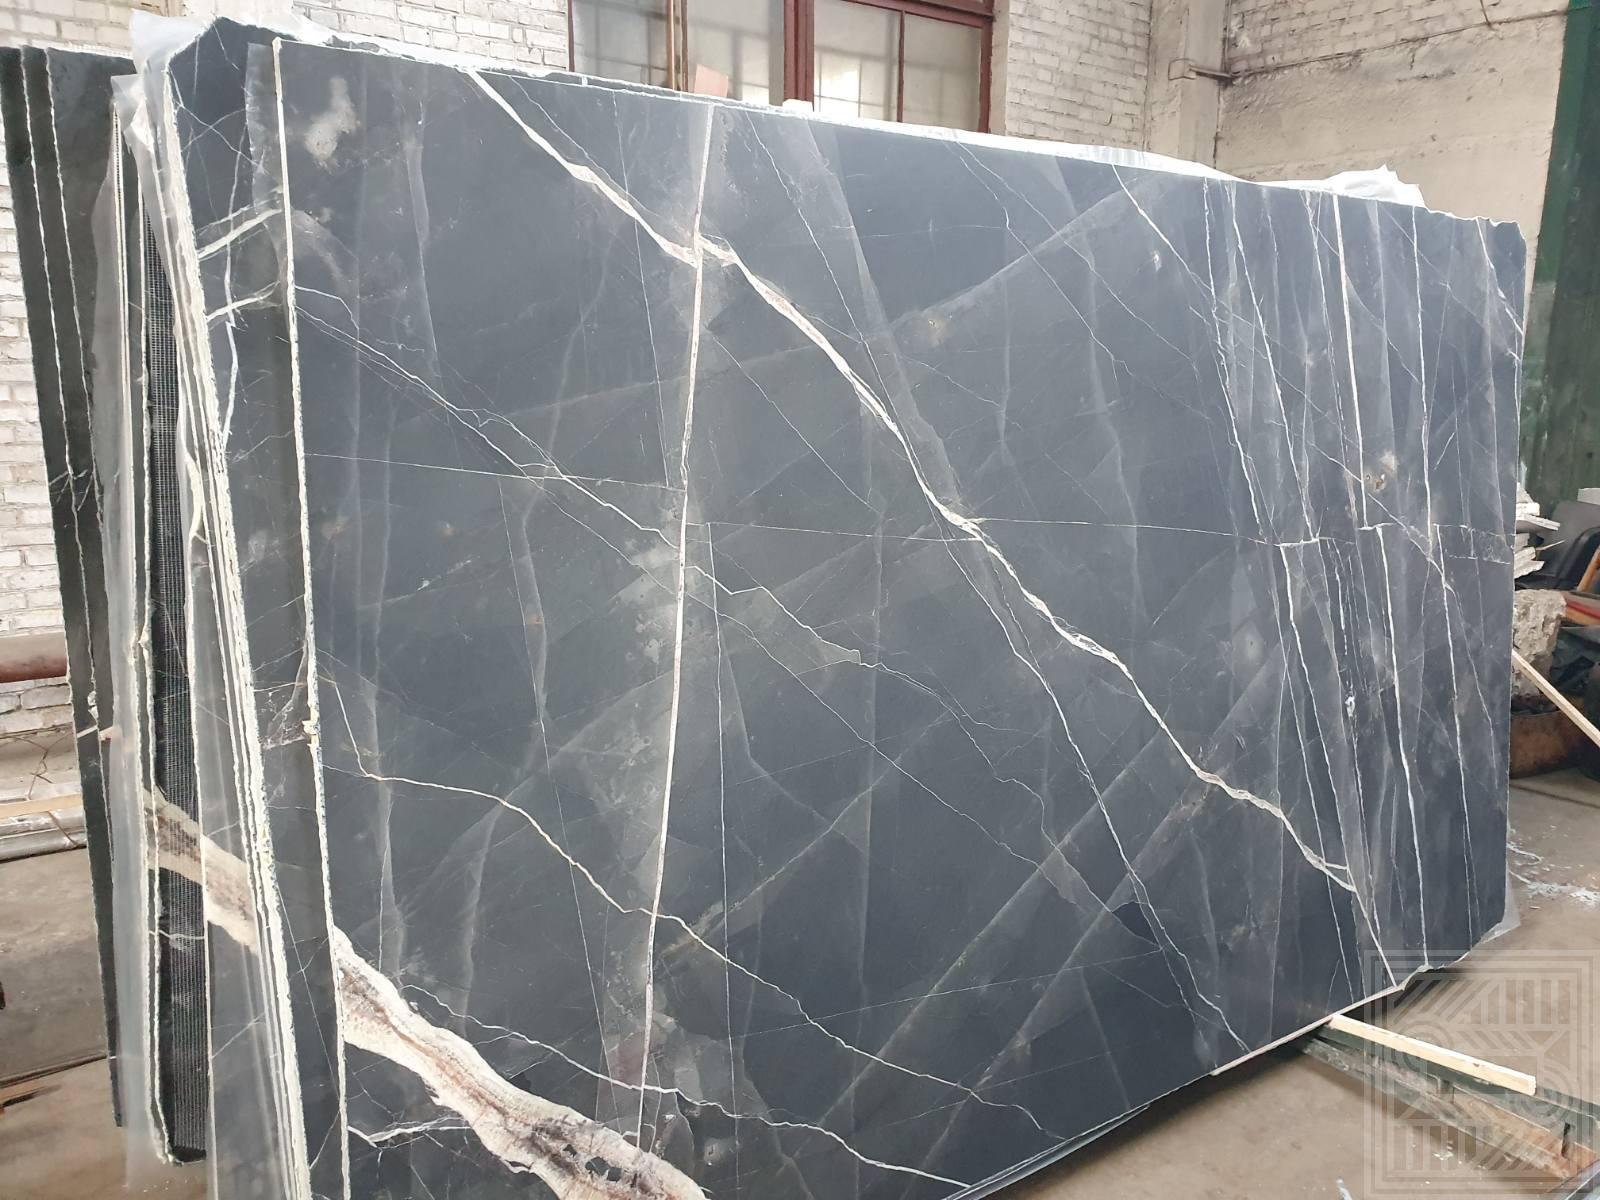 Calacatta Black (20 mm) colored-marble - Mramor Calacatta Black 1